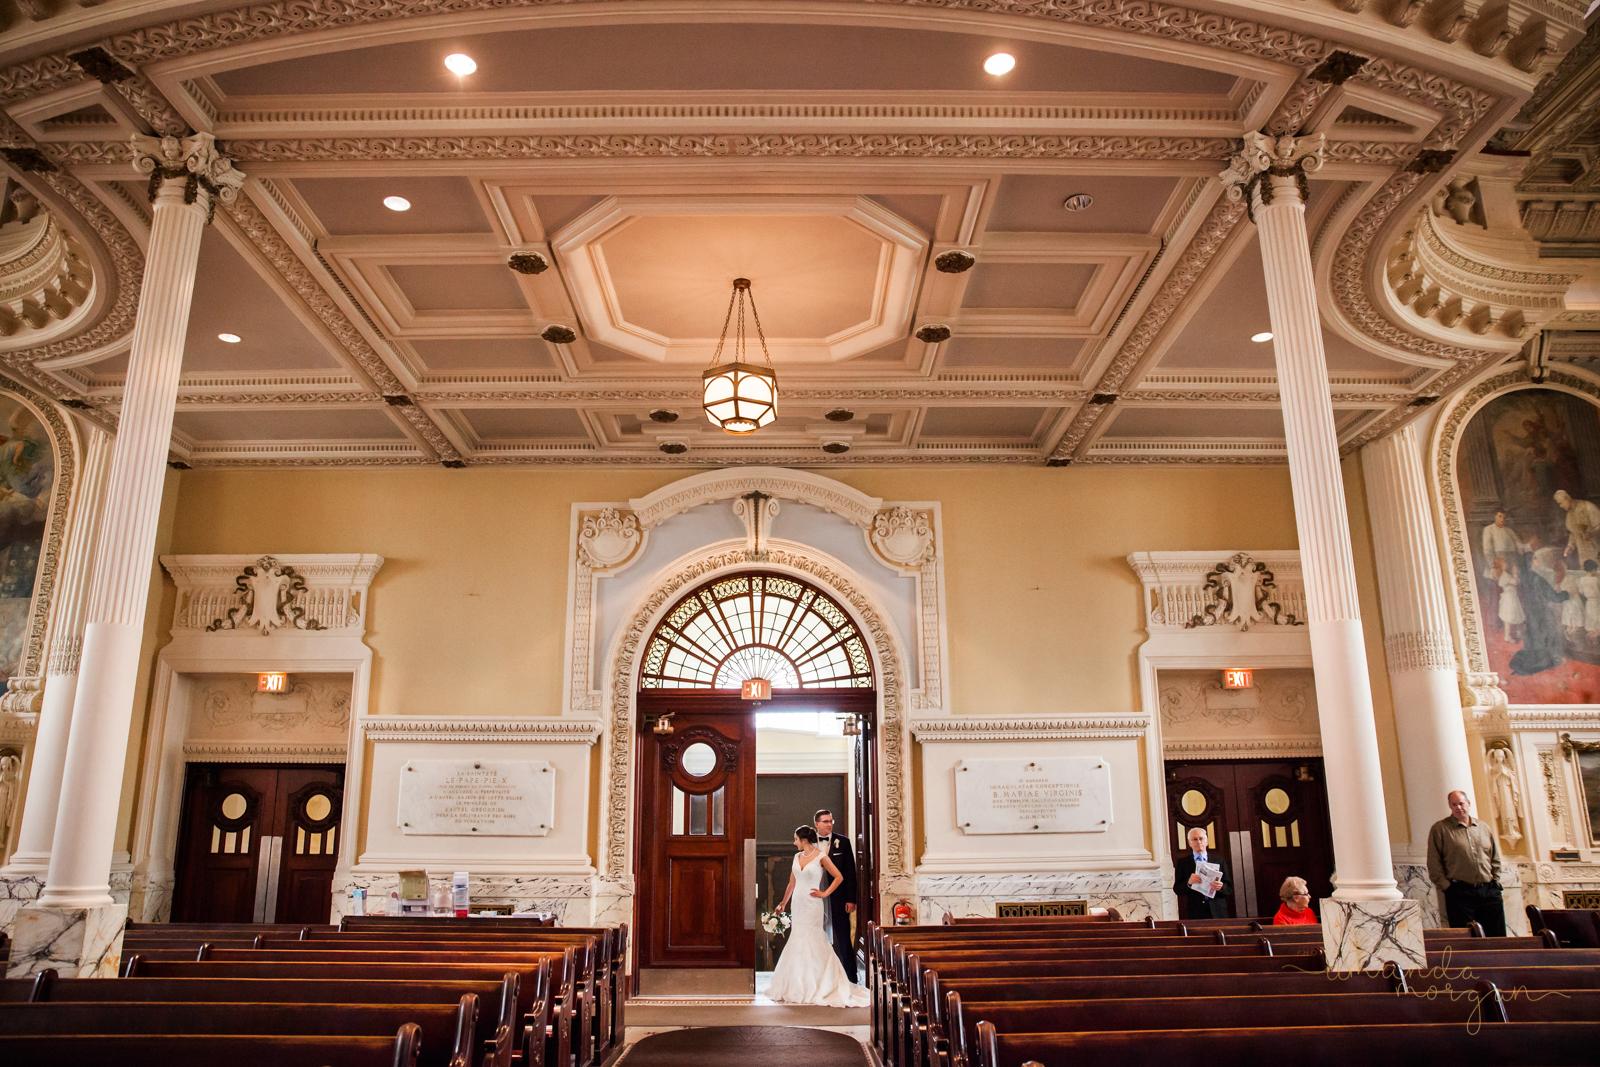 Notre-Dame-Catholic-Church-Wedding-Amanda-Morgan-18.jpg